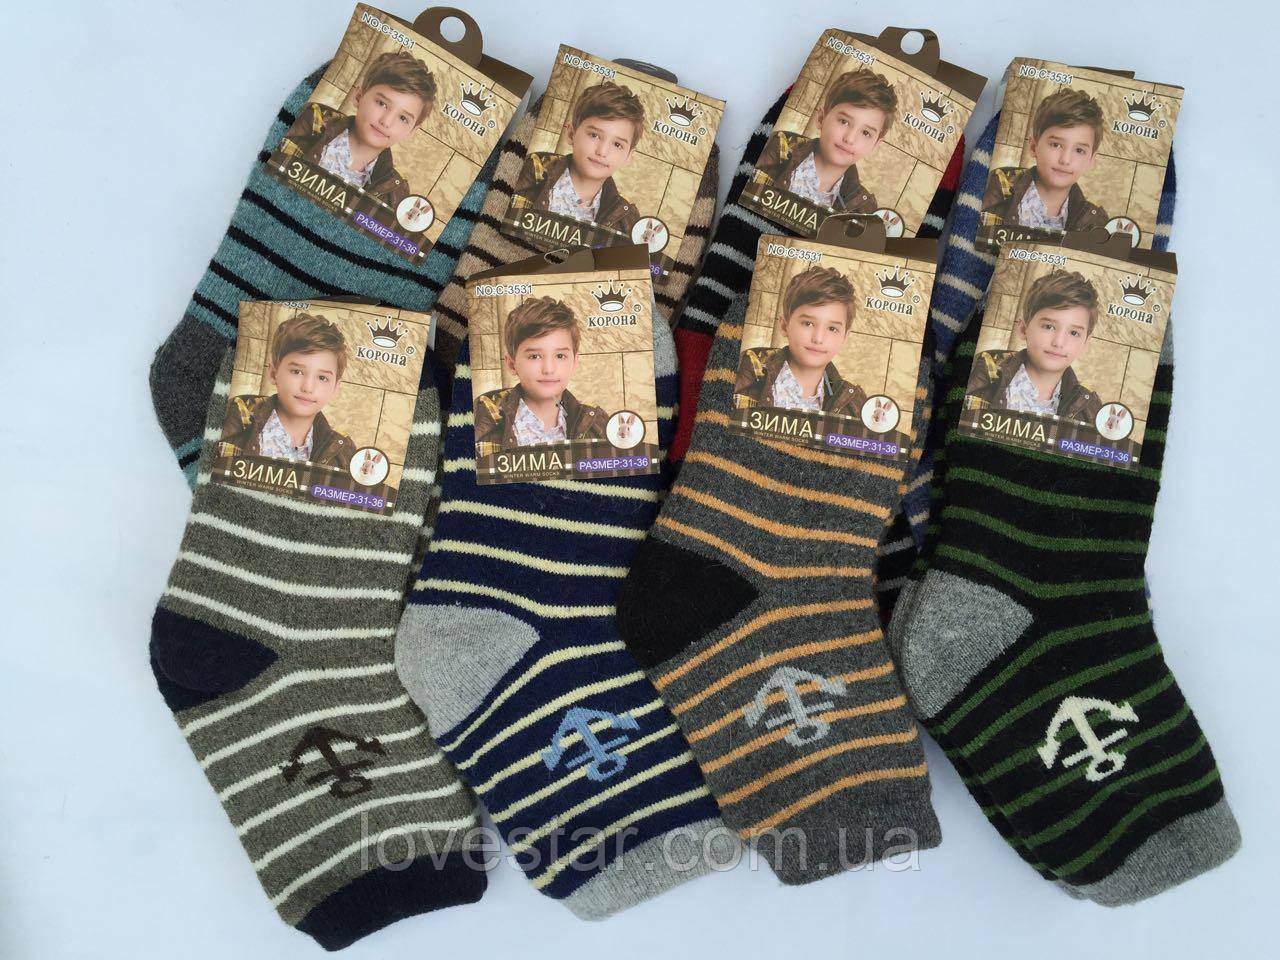 Шерстяные носки Ангора корона 31-36 (C3528)